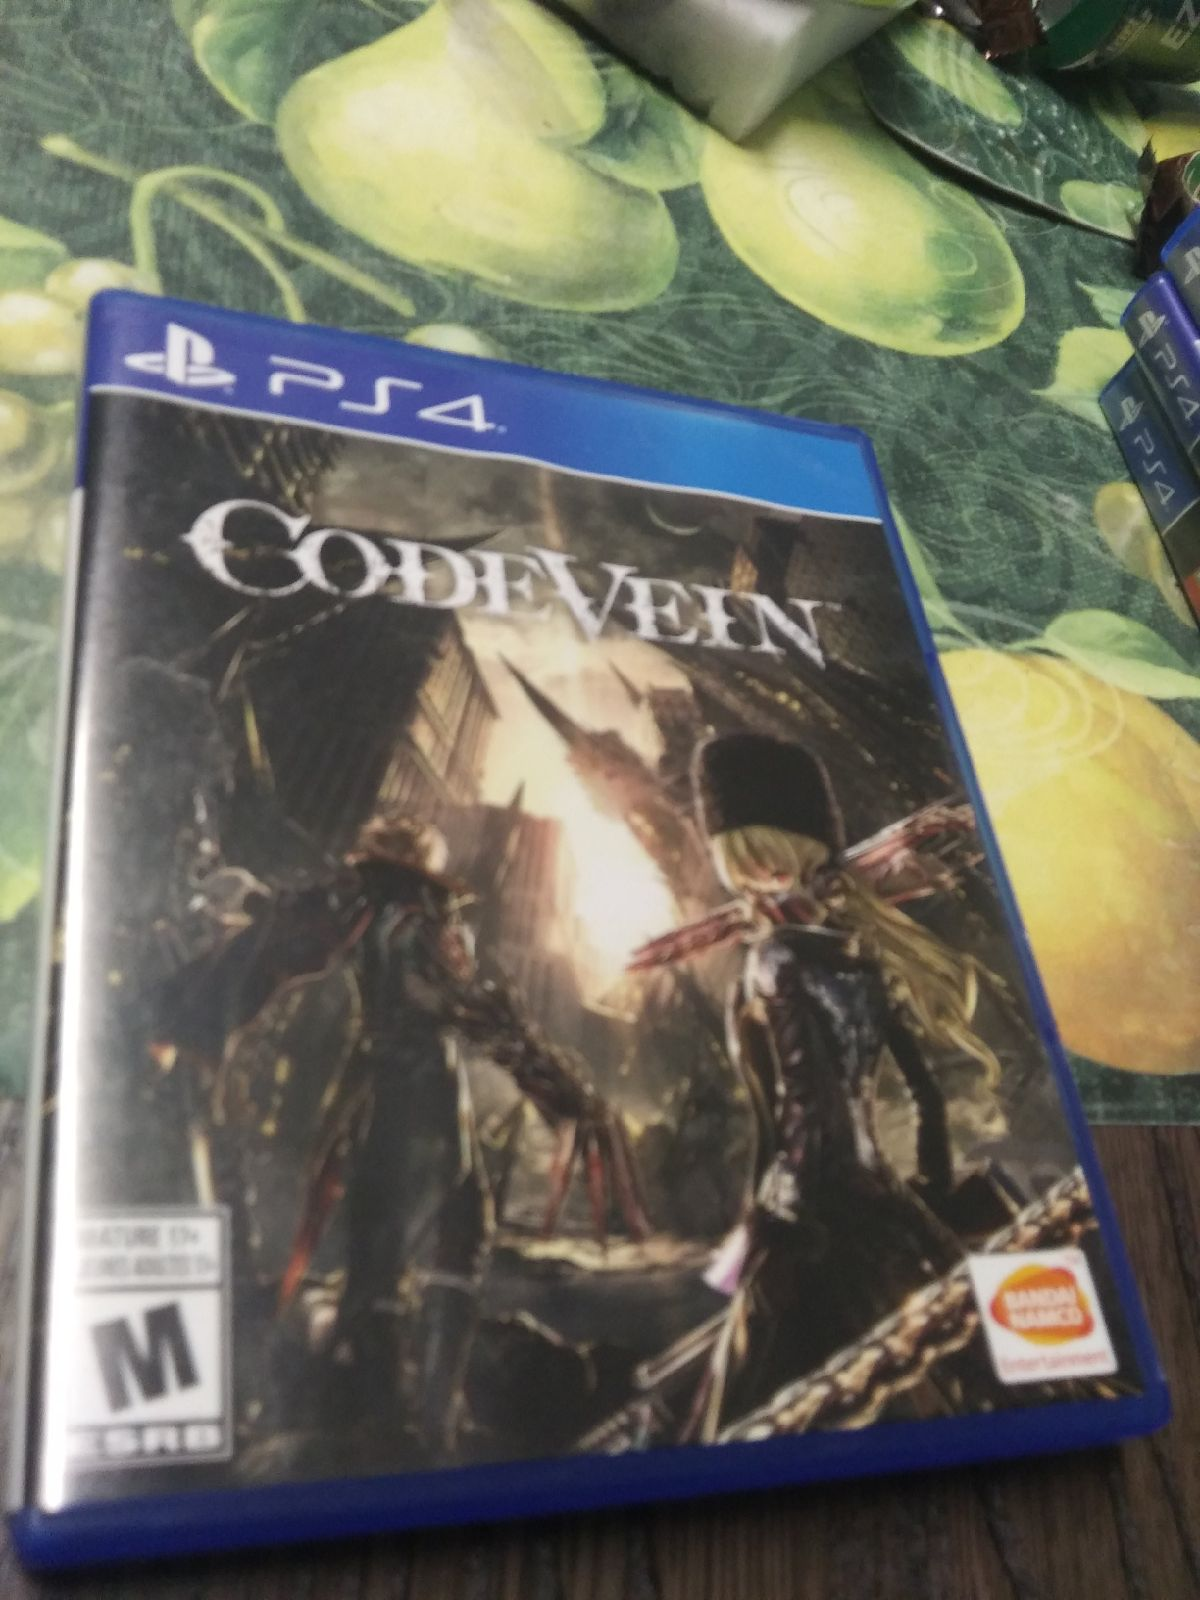 Code Vein on Playstation 4